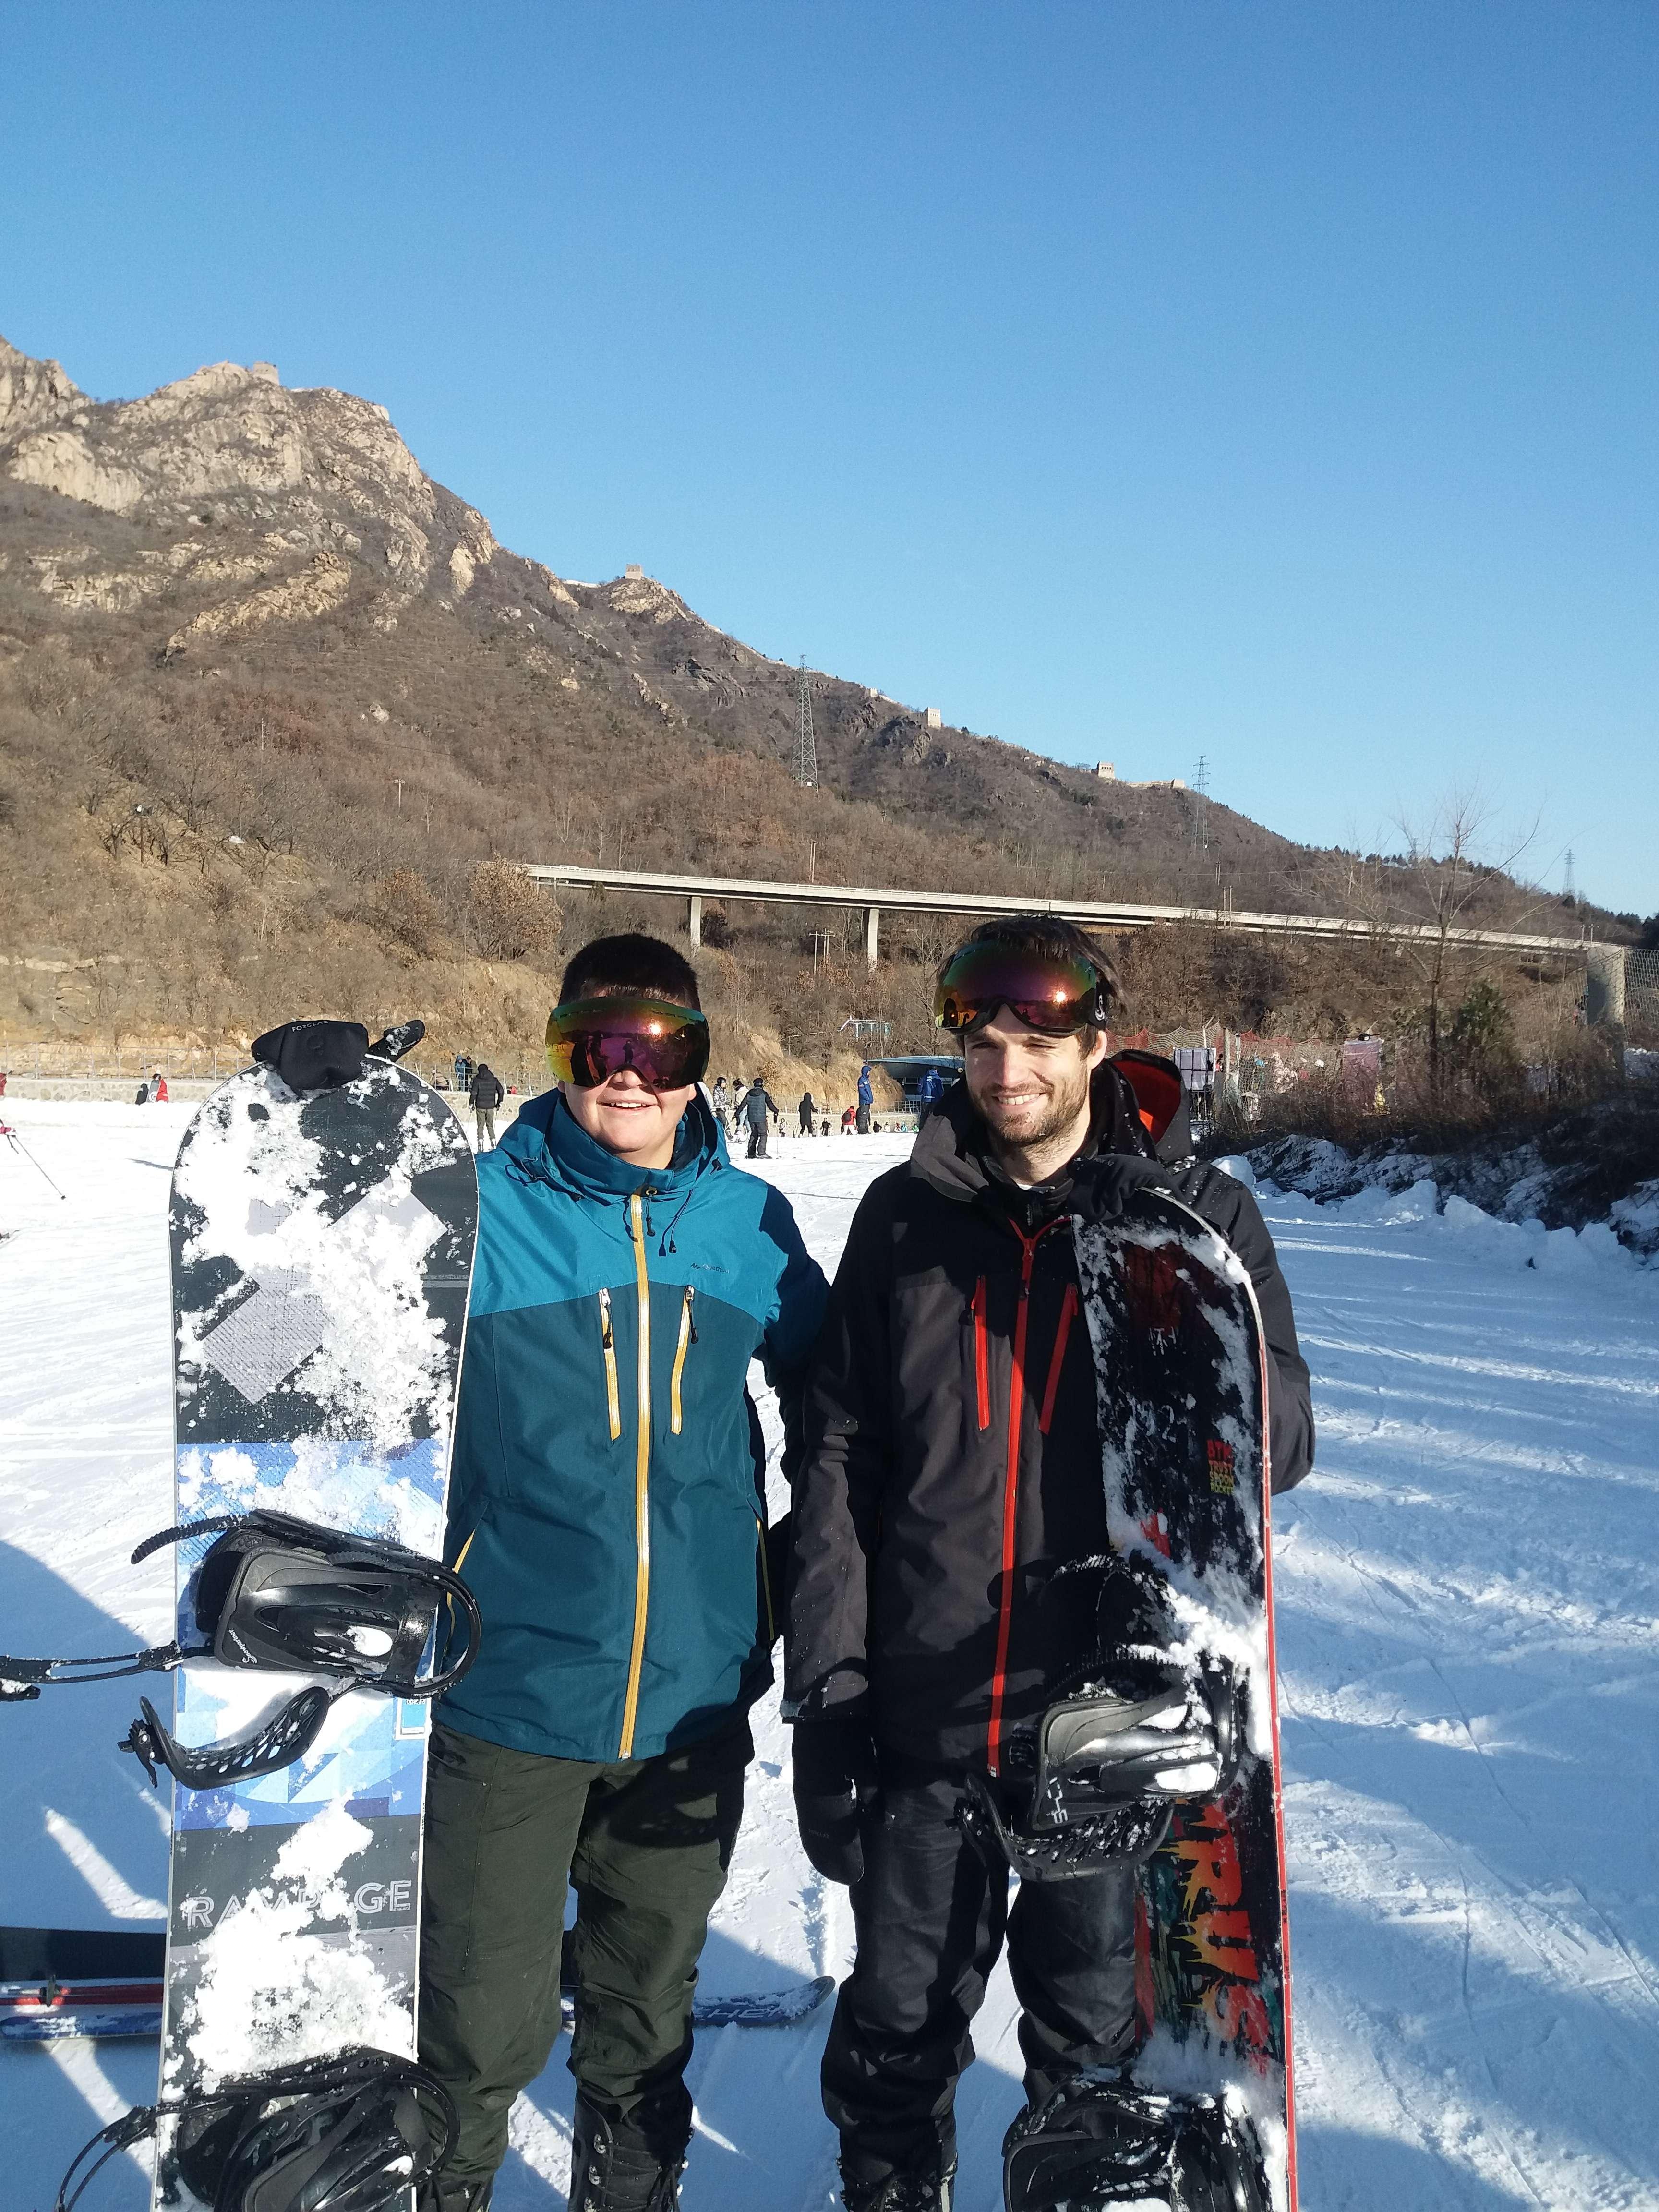 skiing in china at the huaibei international ski resort